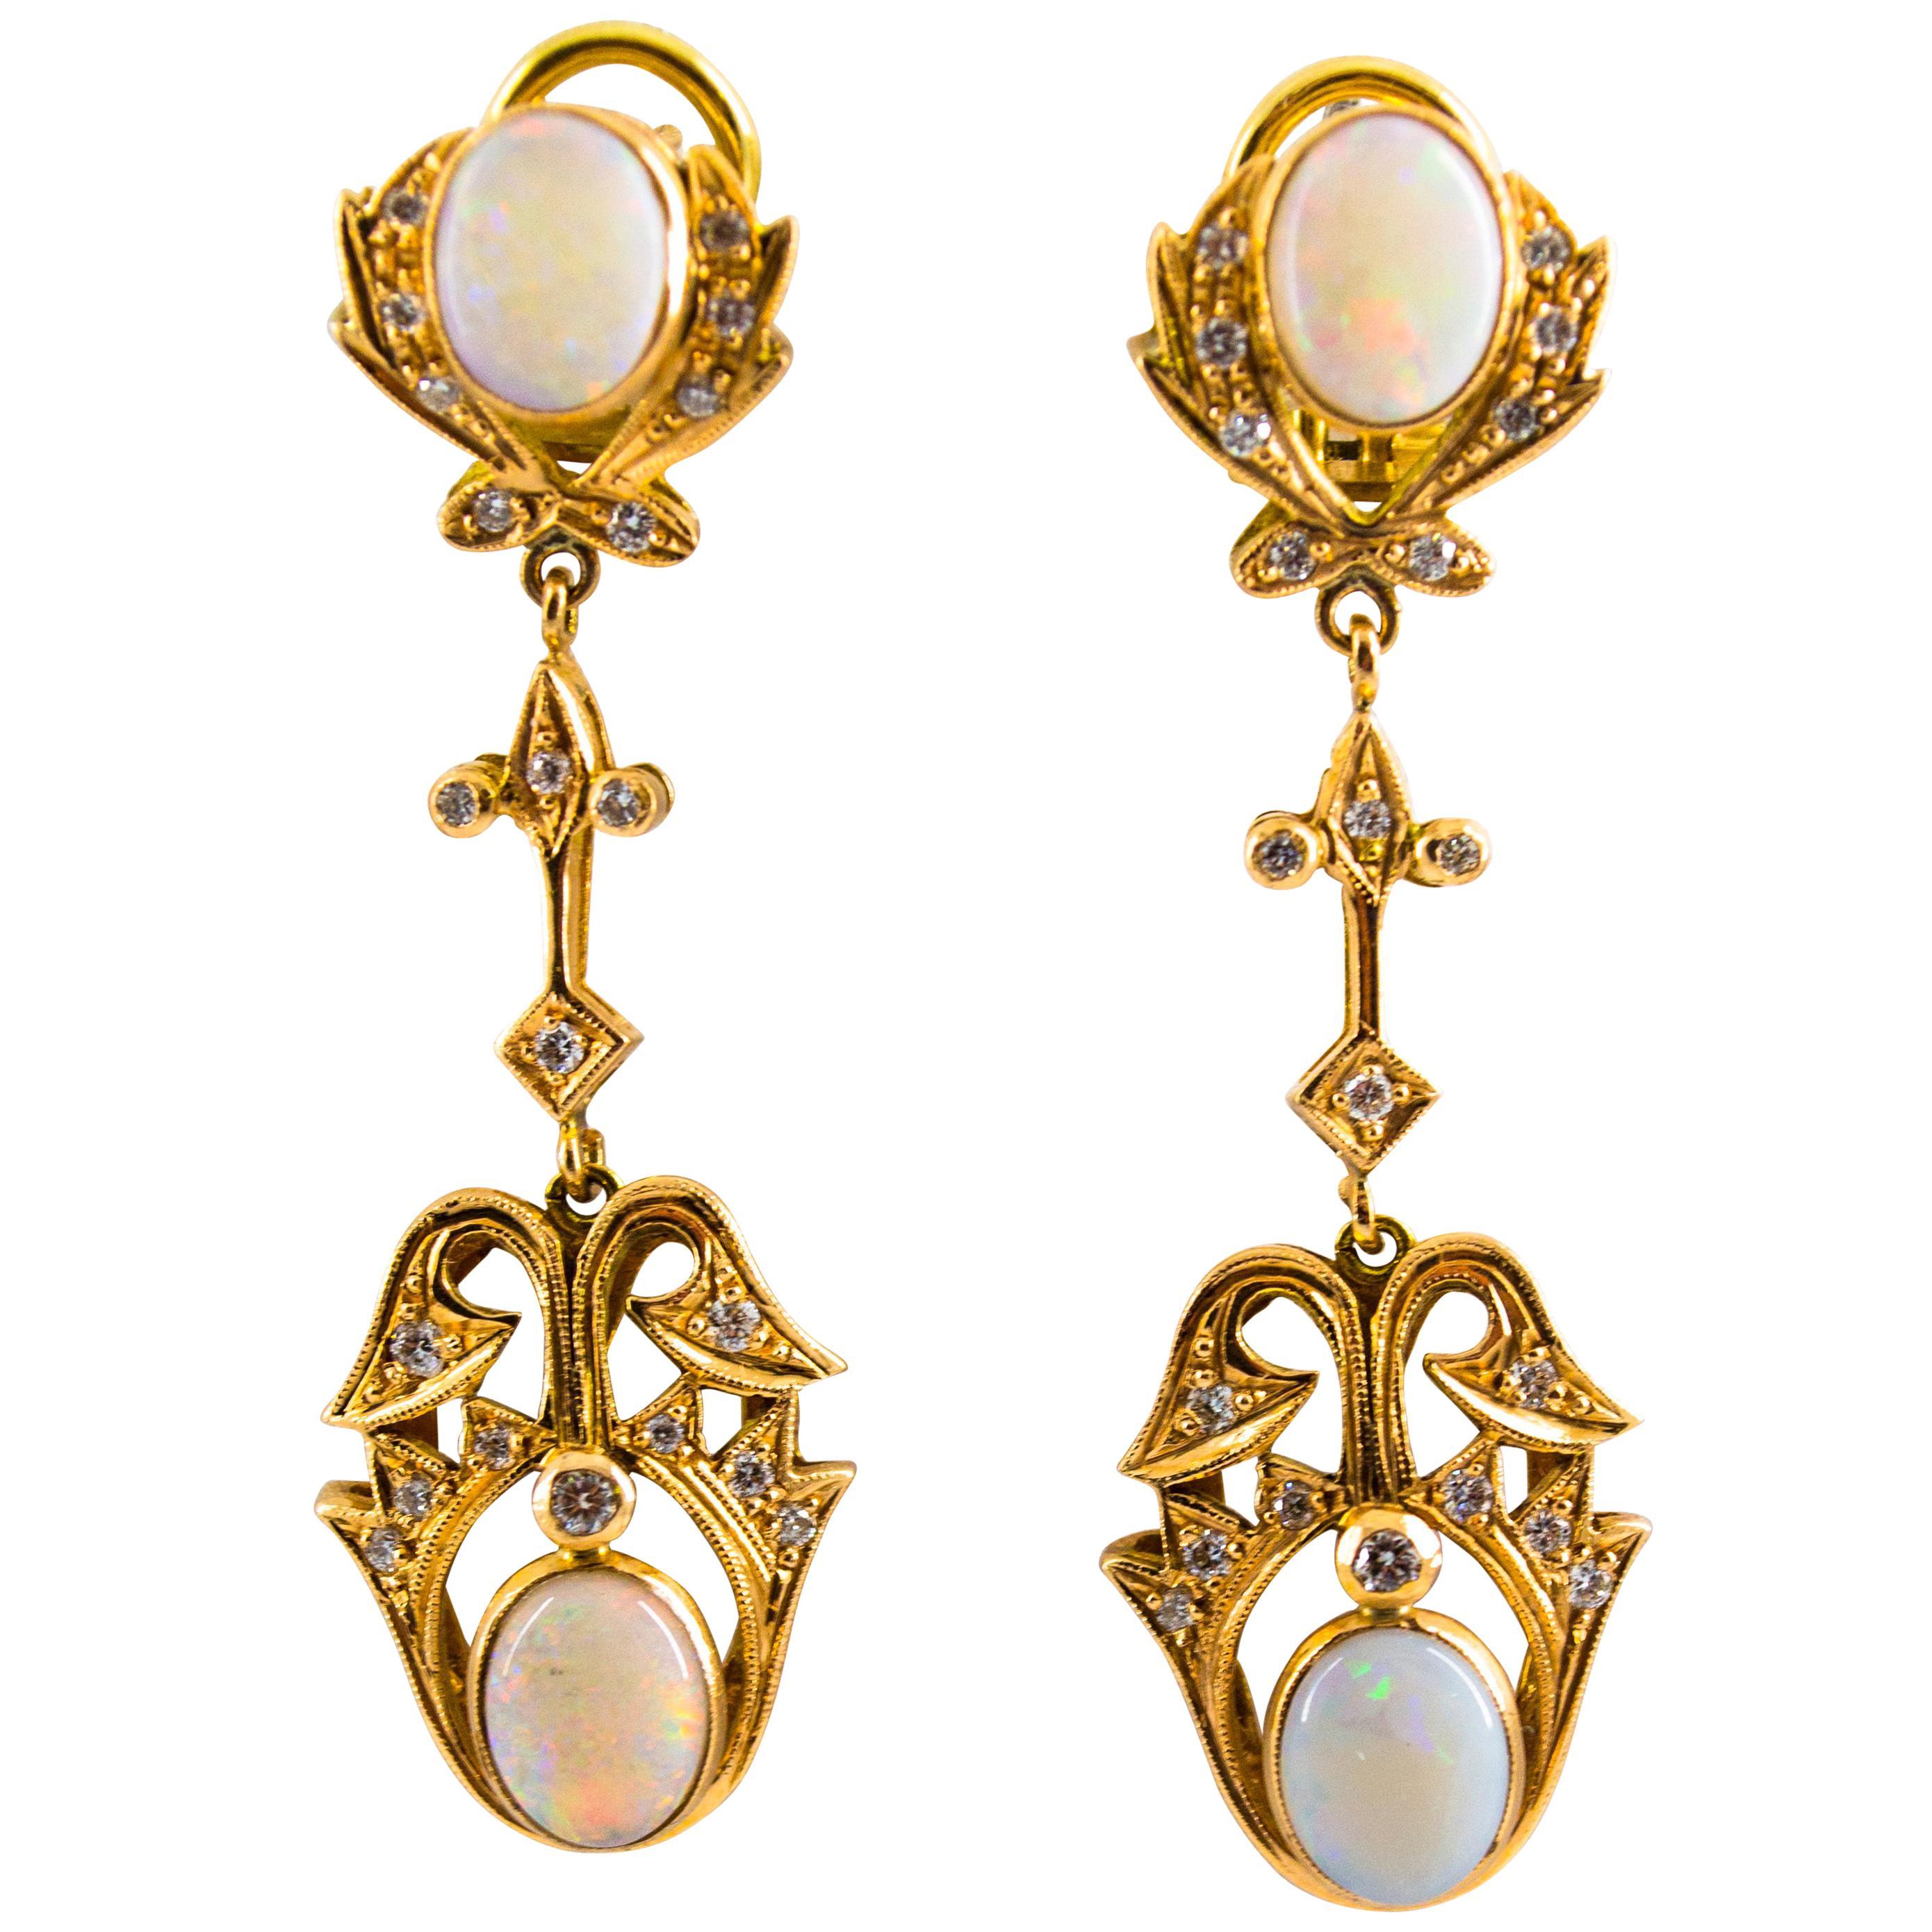 0.90 Carat White Diamond 3.90 Carat Opal Yellow Gold Clip-On Drop Earrings